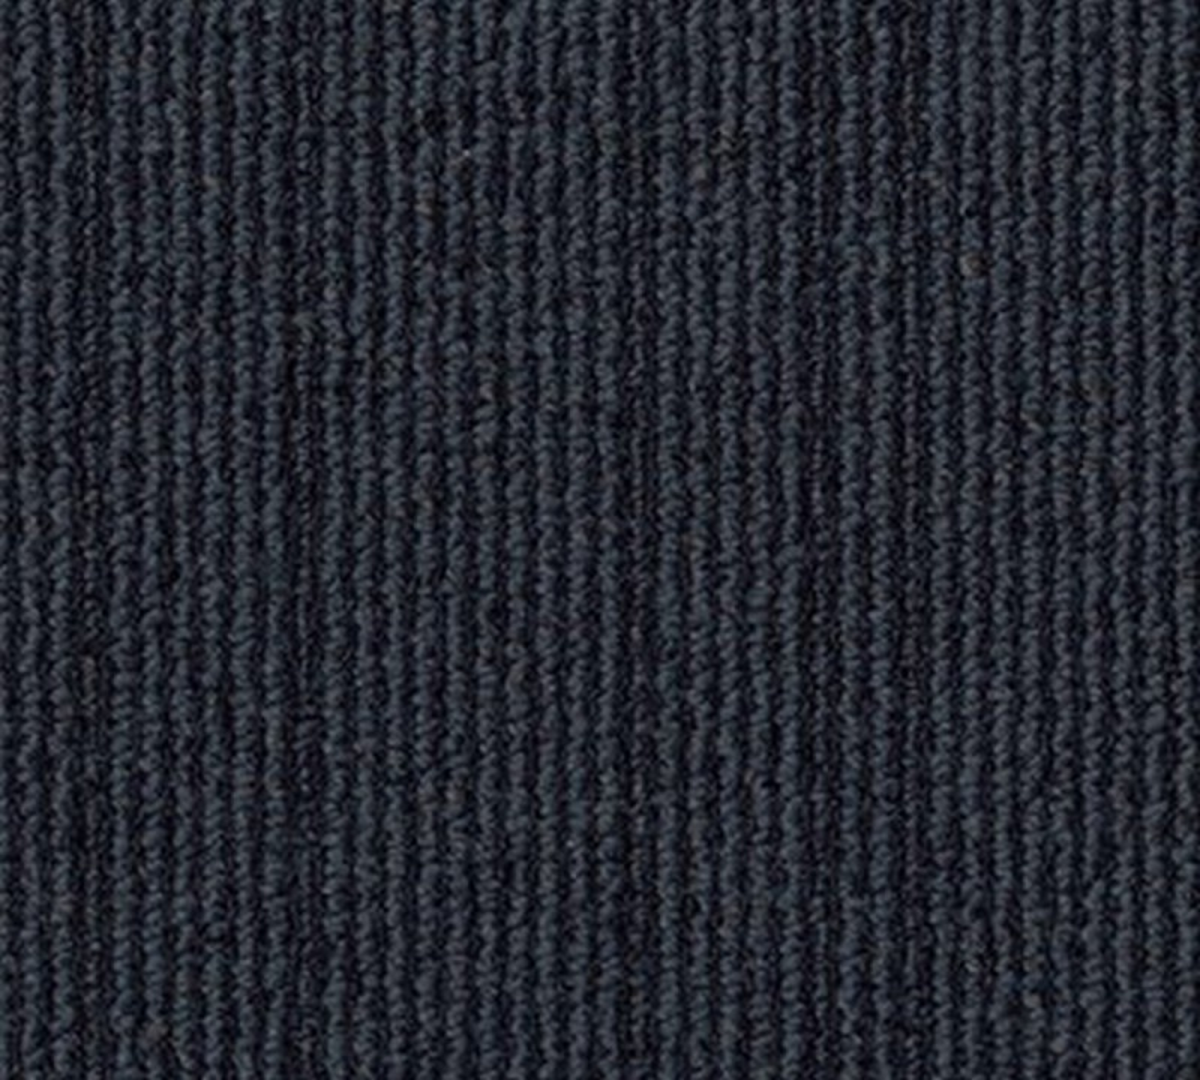 Ковровая плитка DESSO AirMaster 8902 (500*500*6 мм)